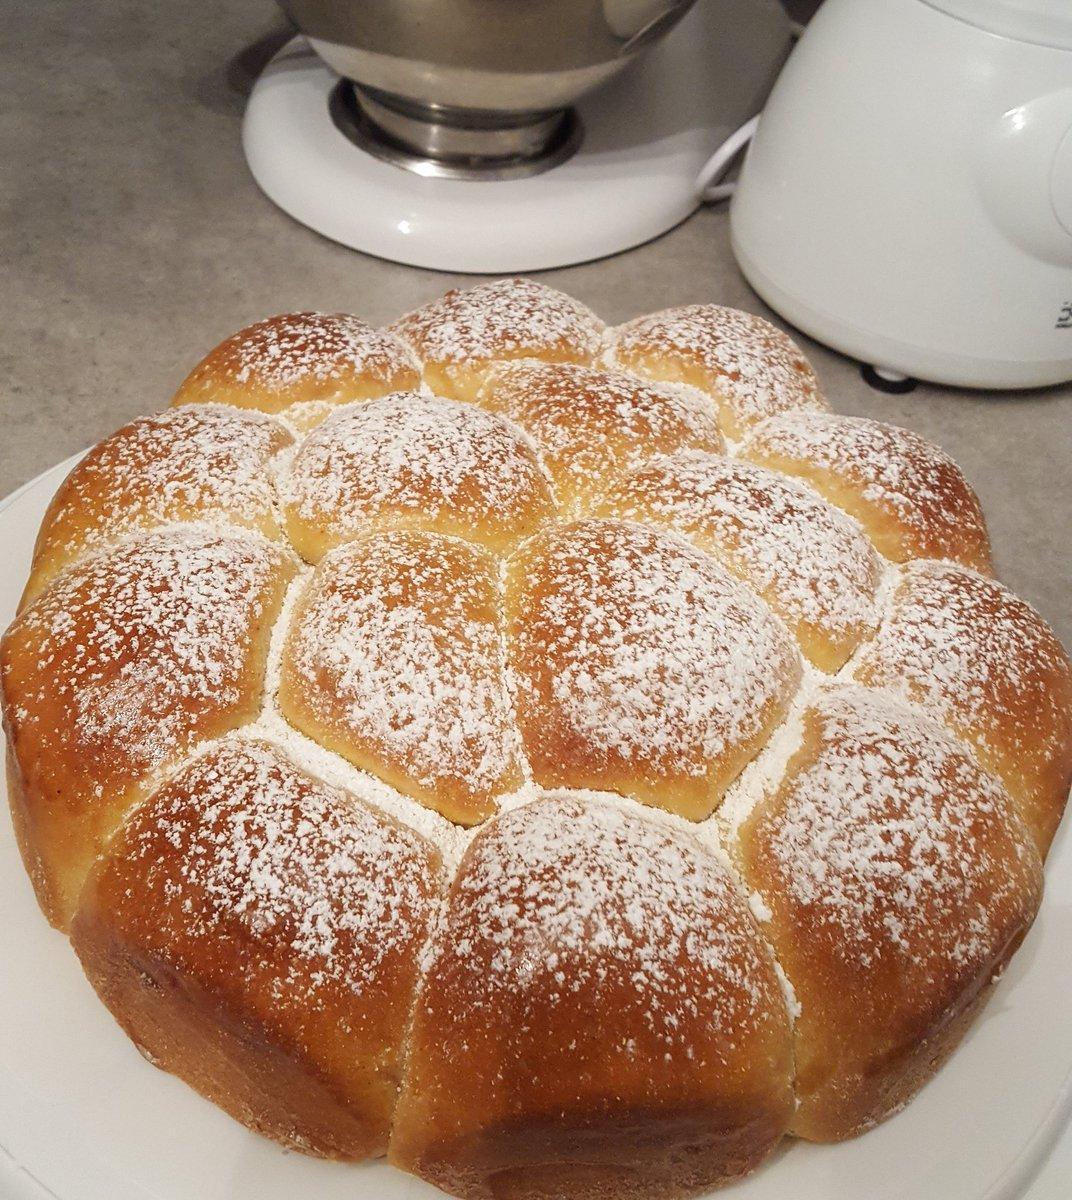 Brioche butchy pour le petit dej de demain matin  #brioche #viennoiserie #déjeuner #food #foodis #foodista<br>http://pic.twitter.com/AIj5PqDJpI